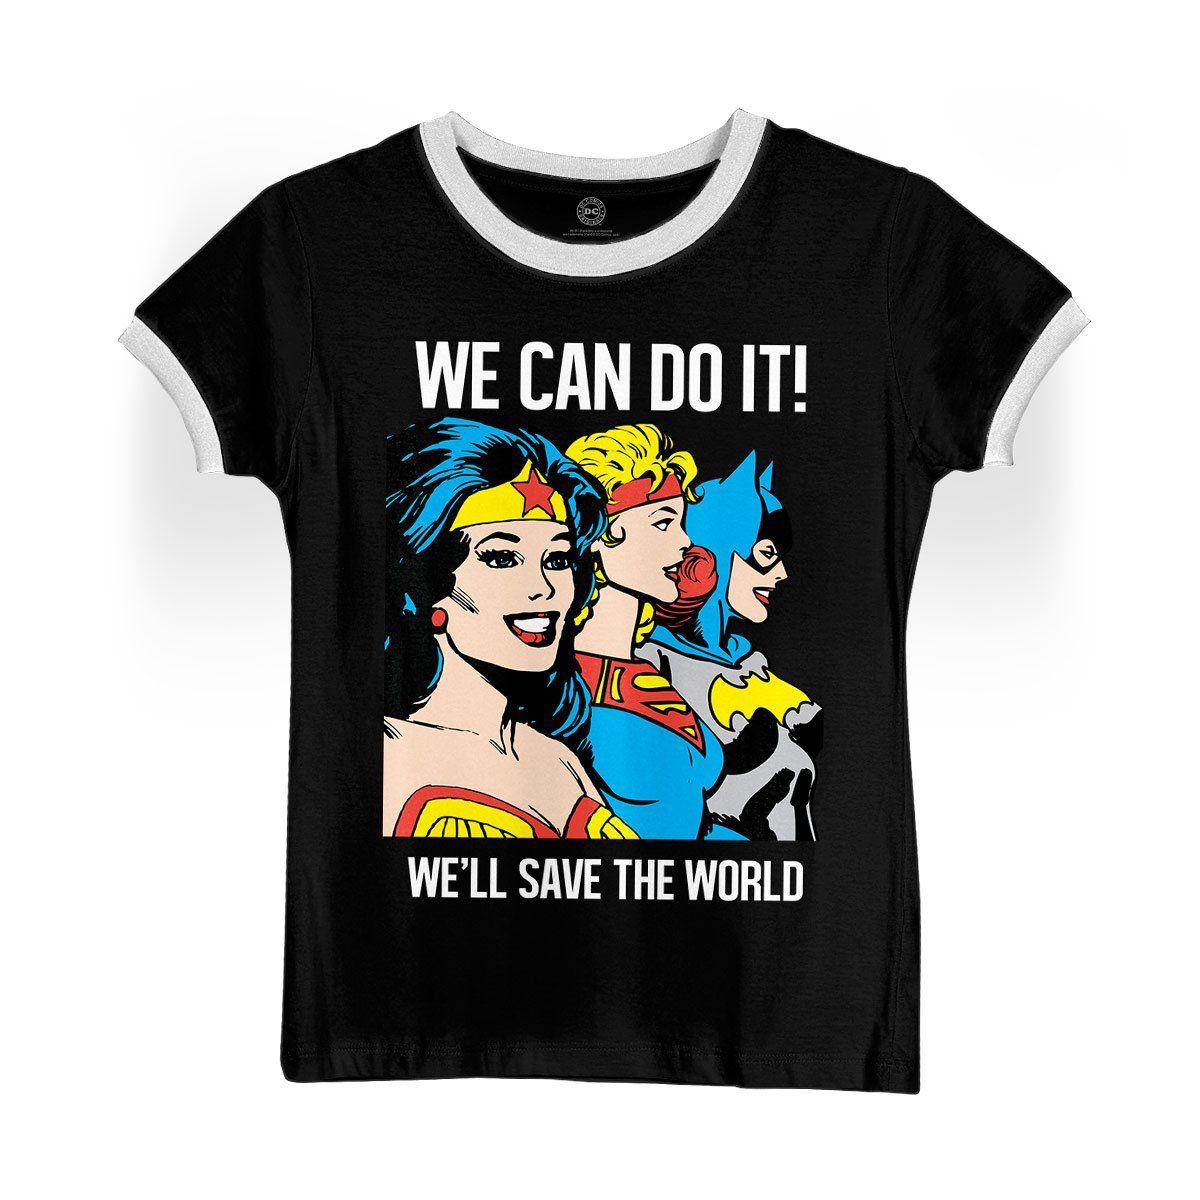 Camiseta Ringer Feminina We Can Do It